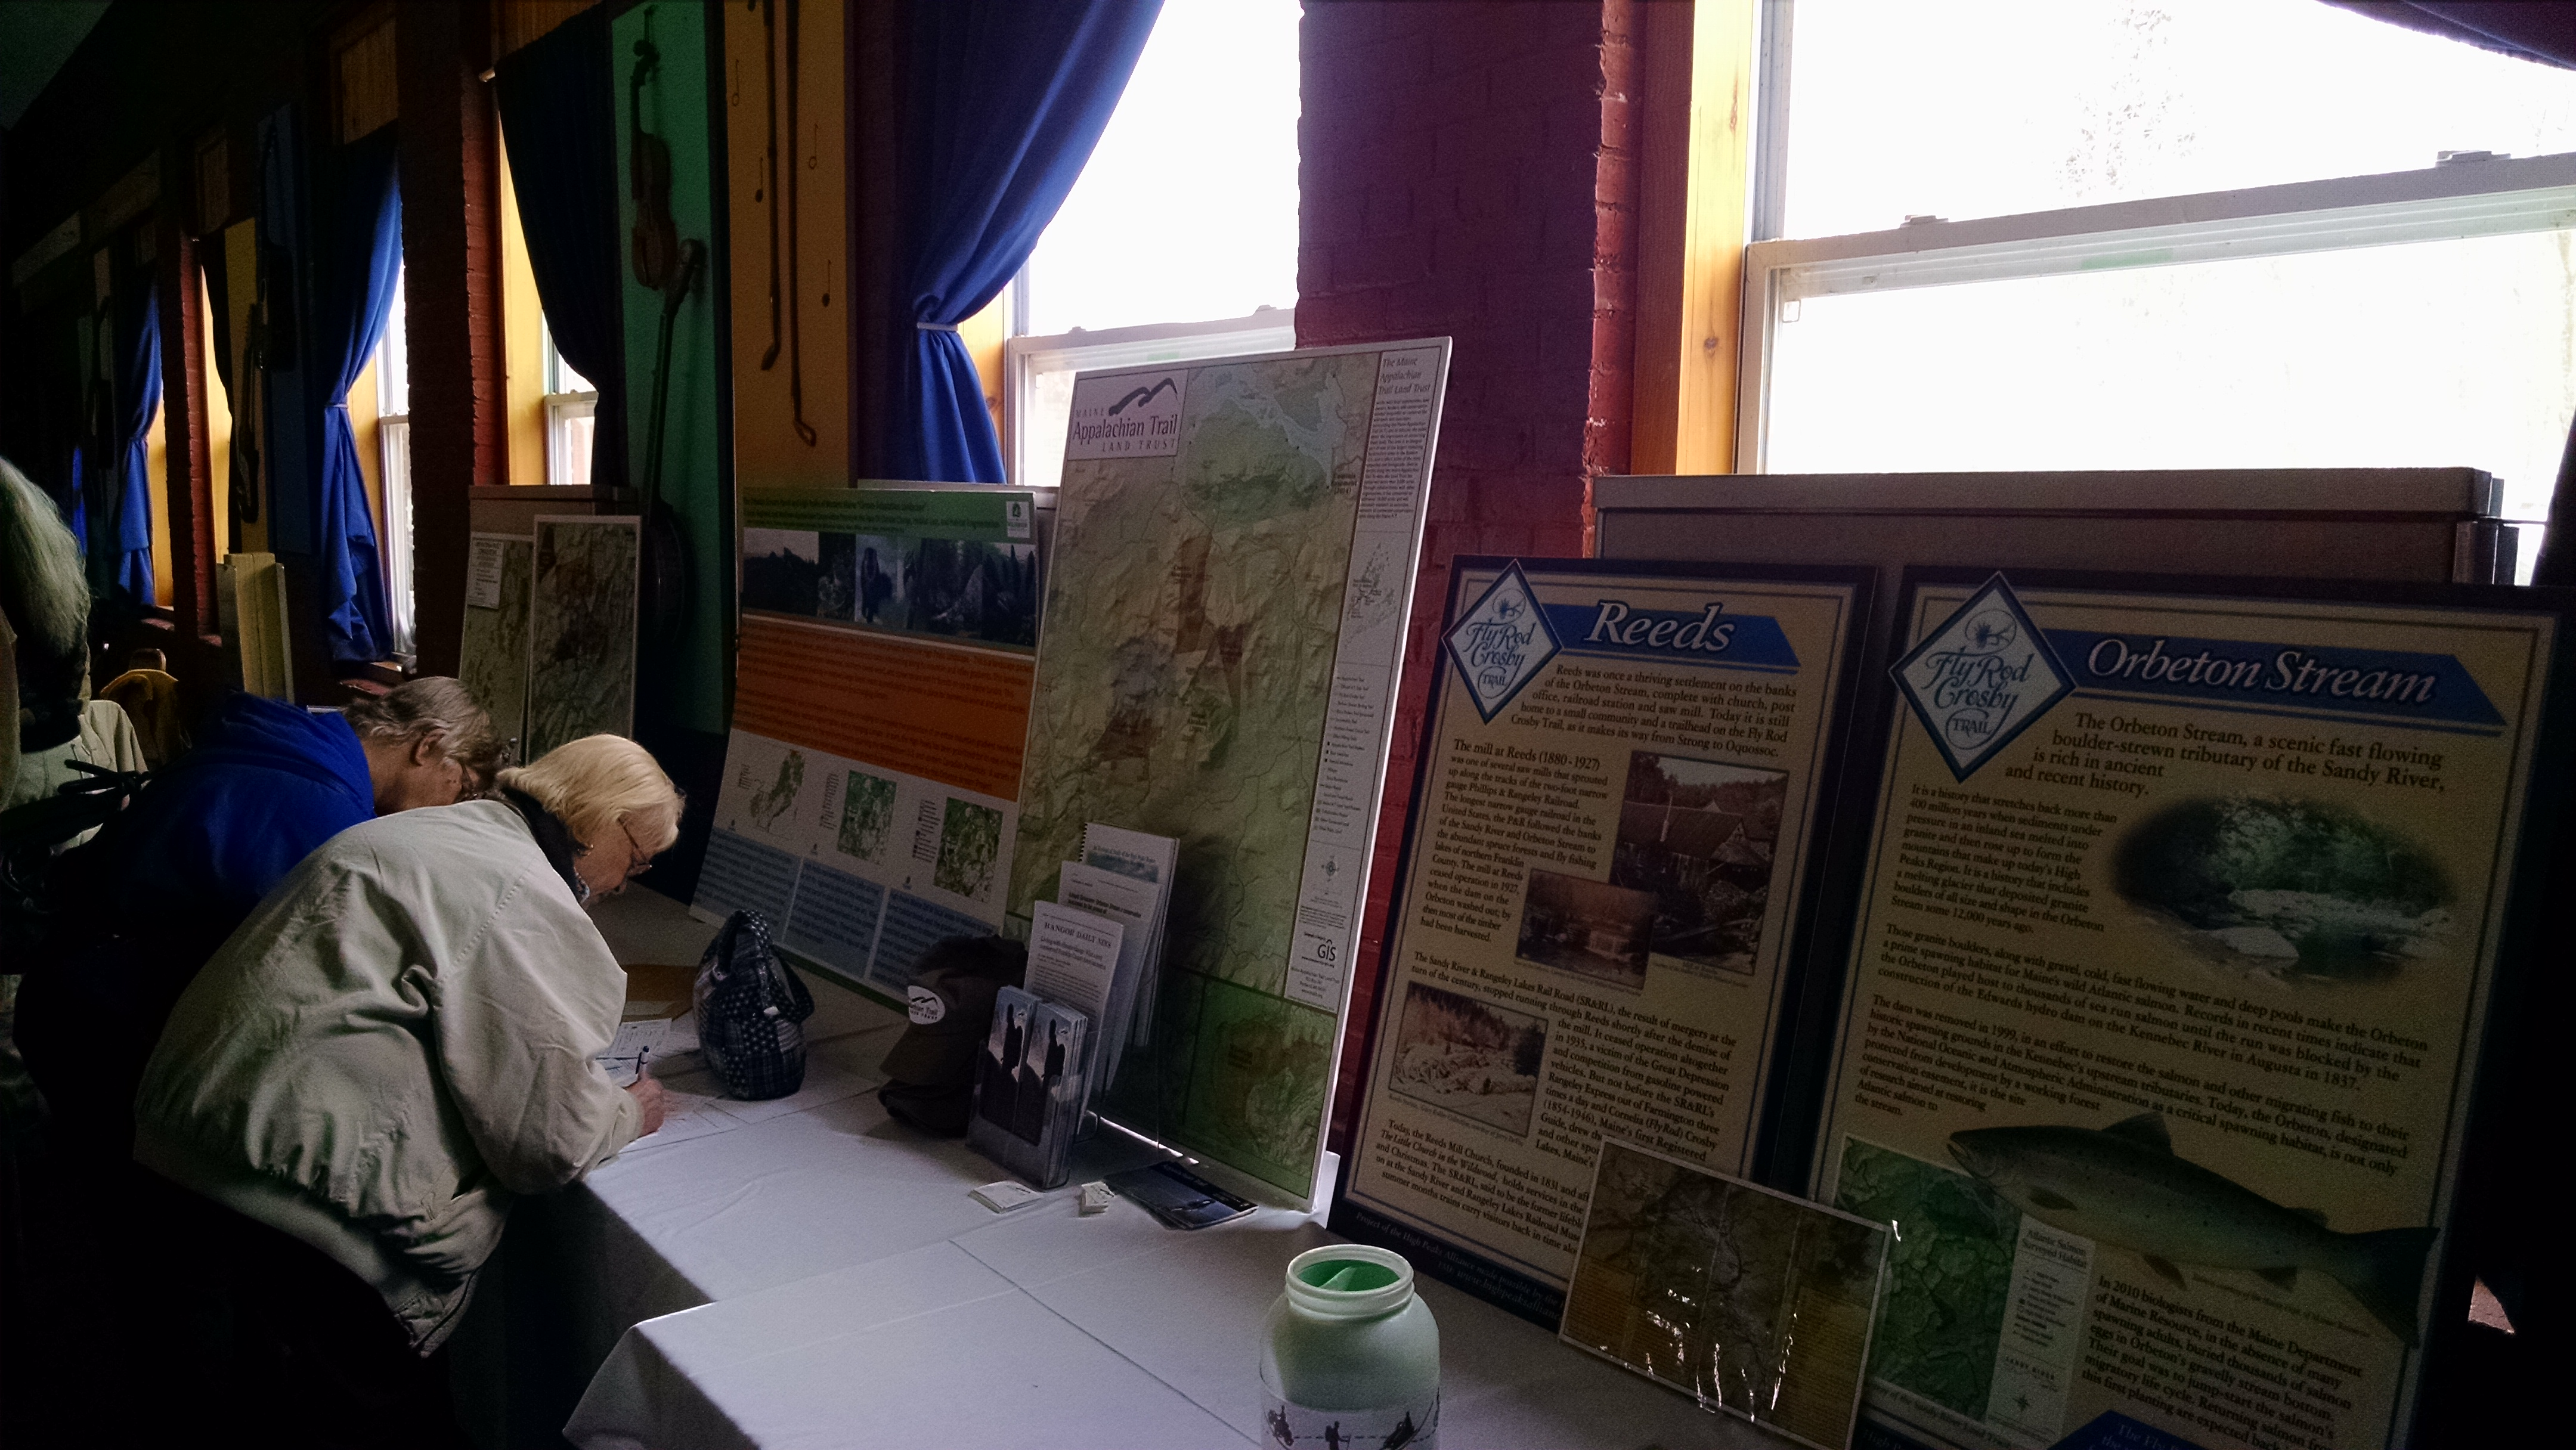 Maps on display.